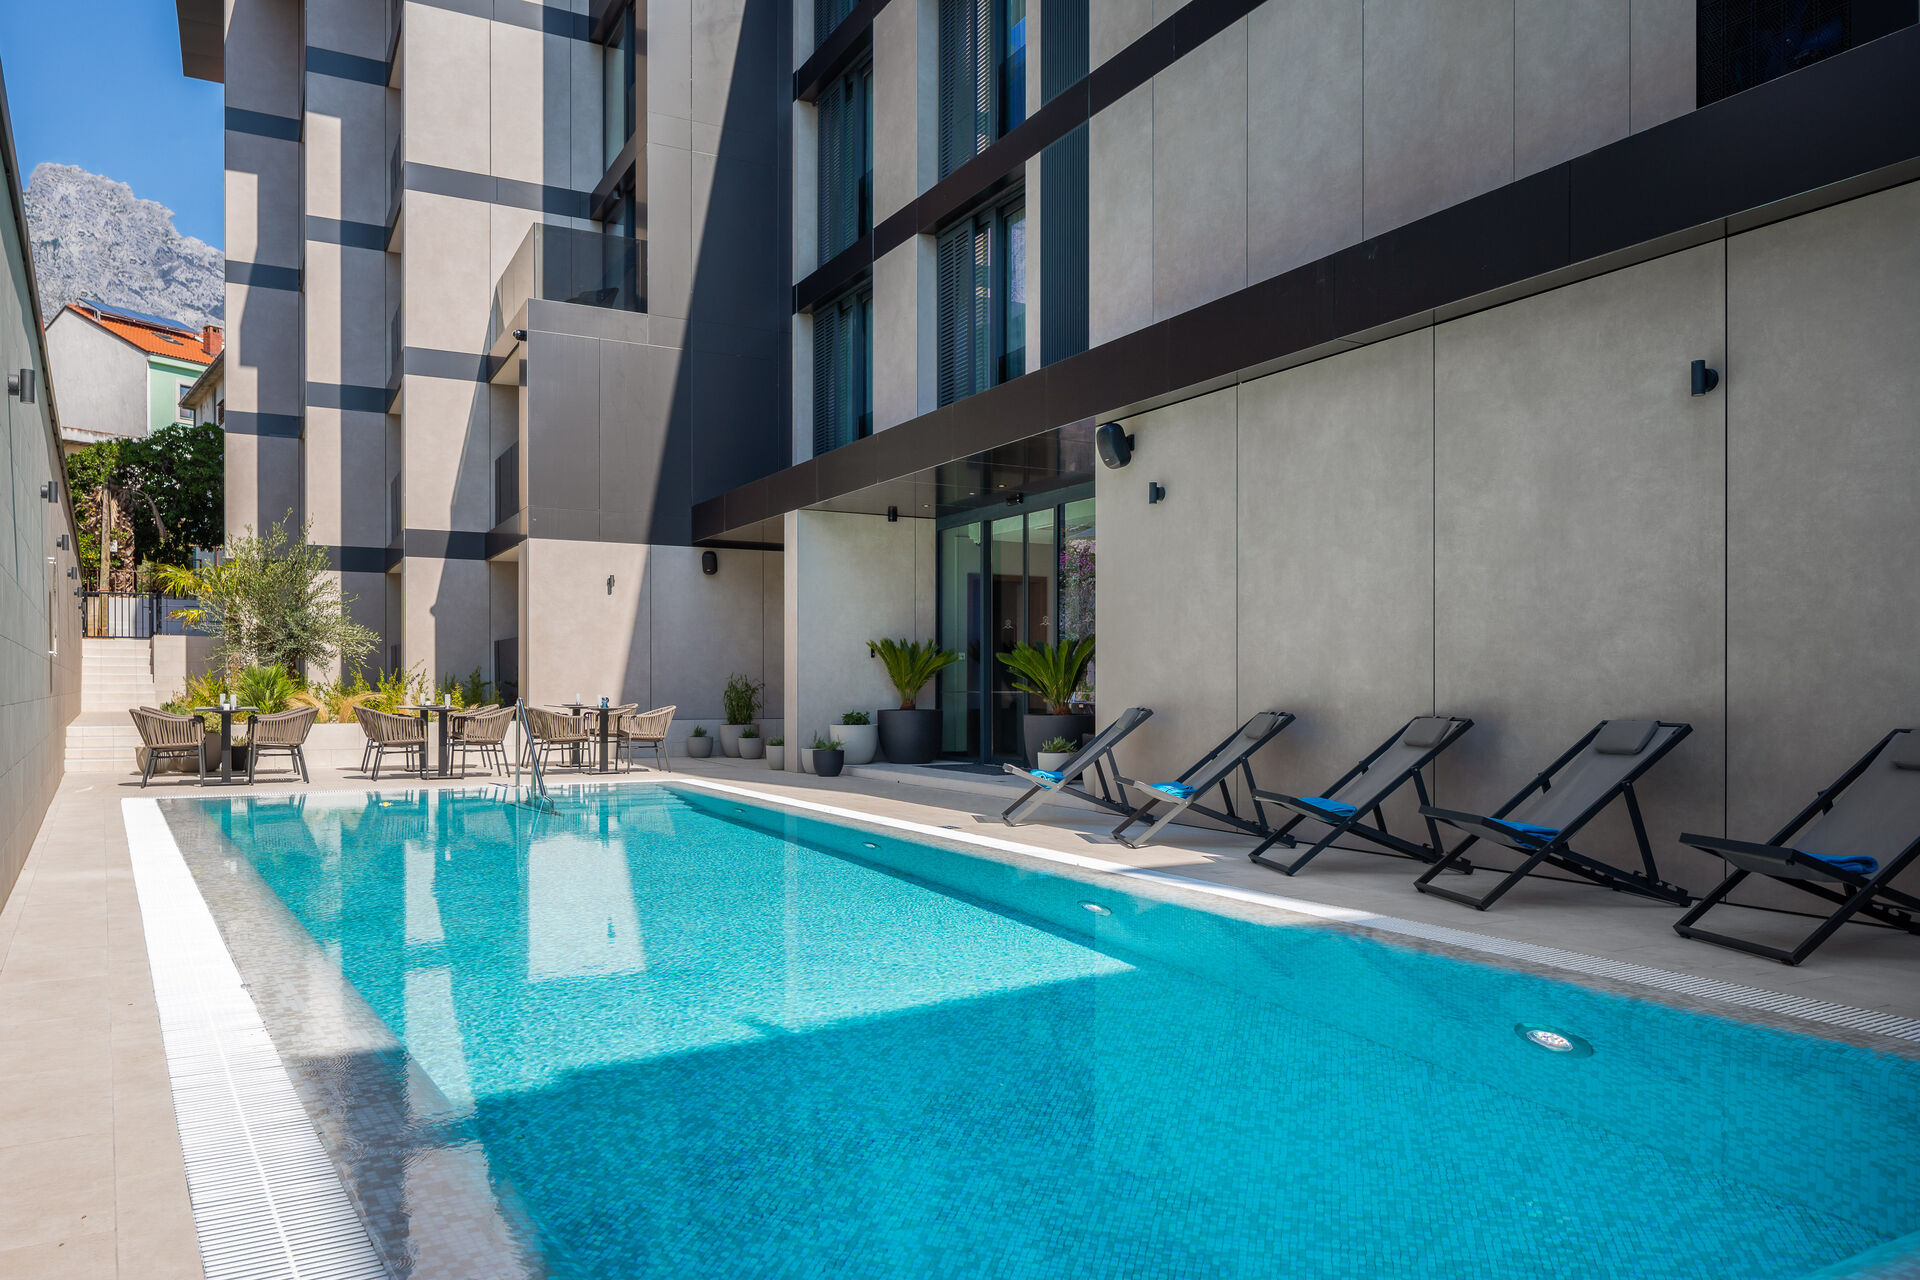 https://cms.satur.sk/data/imgs/tour_image/orig/outdoor-pool_hotel-noemia-1-1949956.jpg